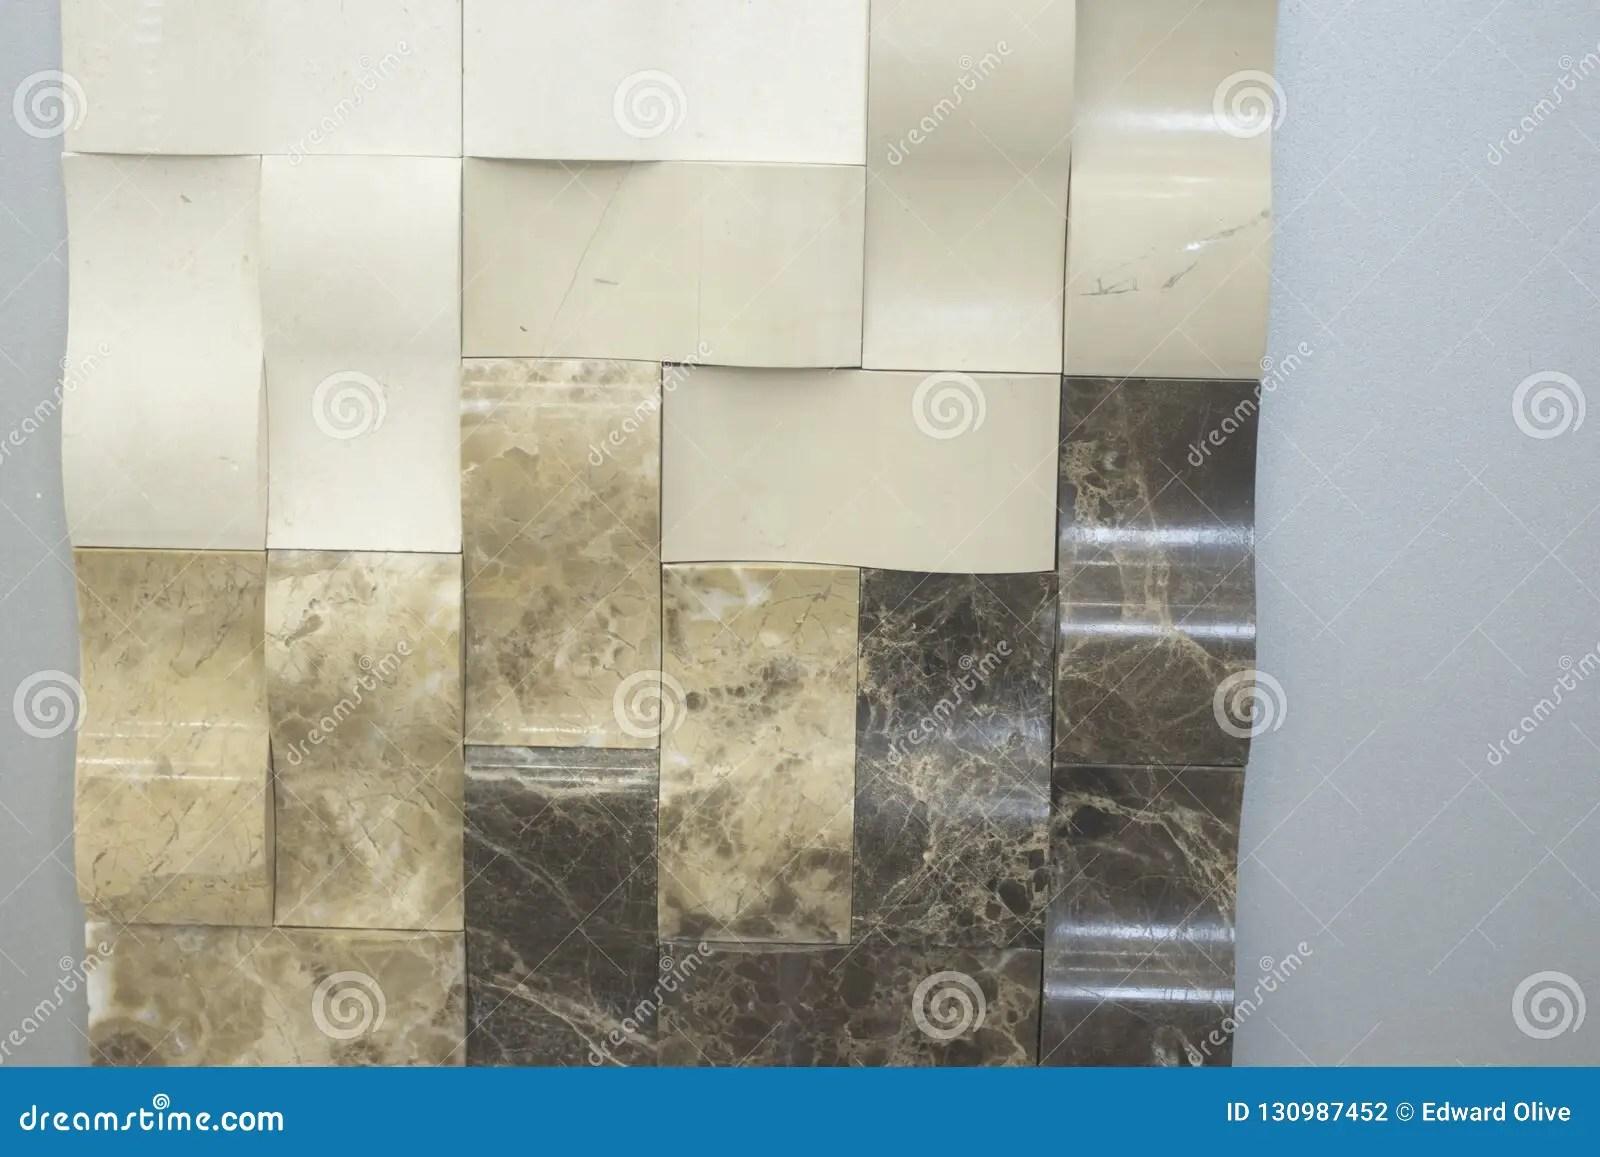 https www dreamstime com kitchen bathroom tiles display showroom new tiling option floors walls home building improvement works image130987452